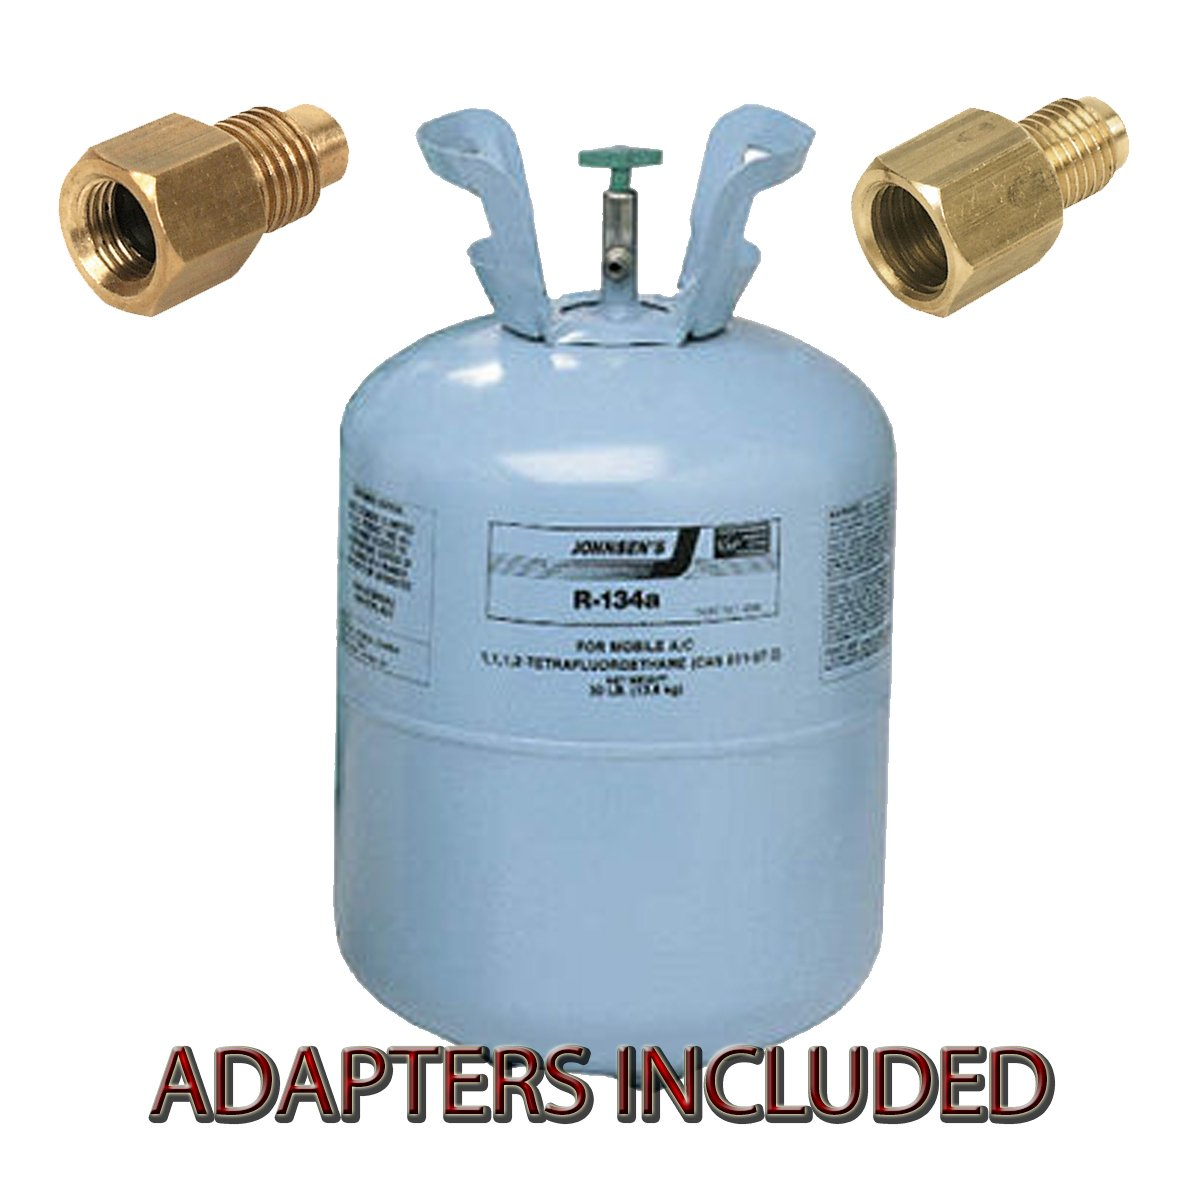 Cheap Dupont R134a 30 Lb Cylinder, find Dupont R134a 30 Lb Cylinder ...